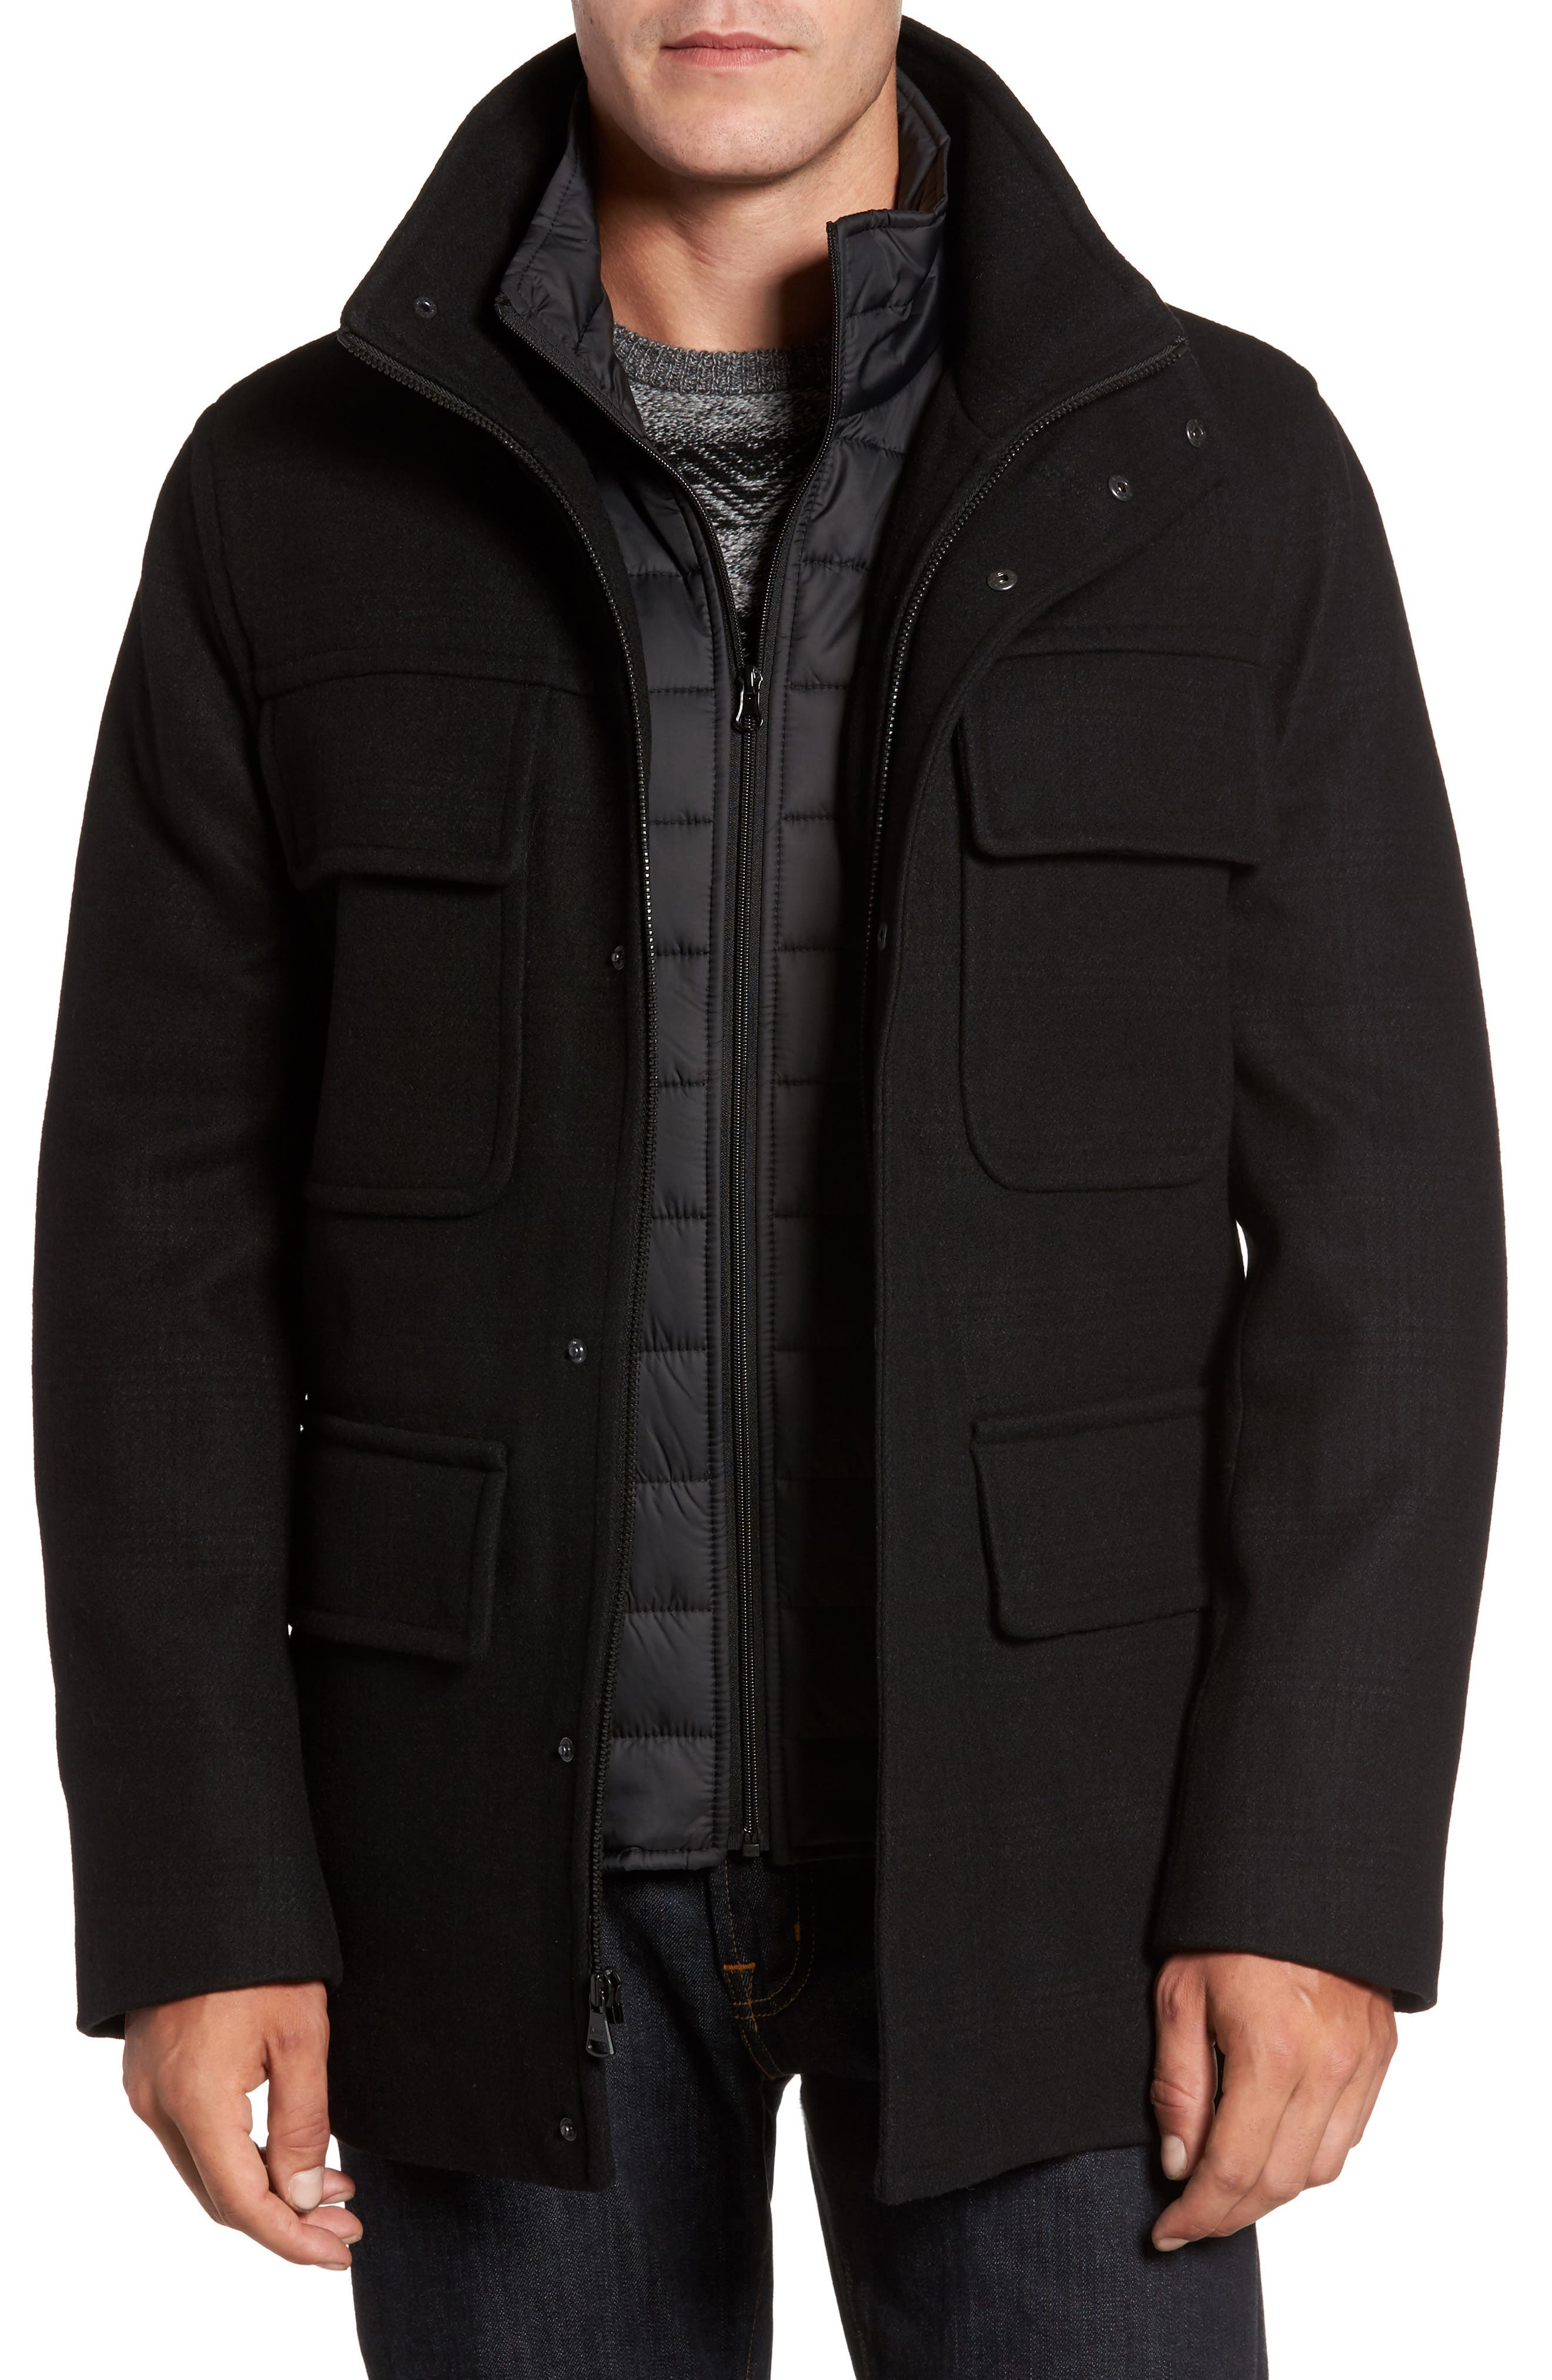 Shadow Plaid Wool Blend Jacket with Detachable Insert,                         Main,                         color, Black Plaid